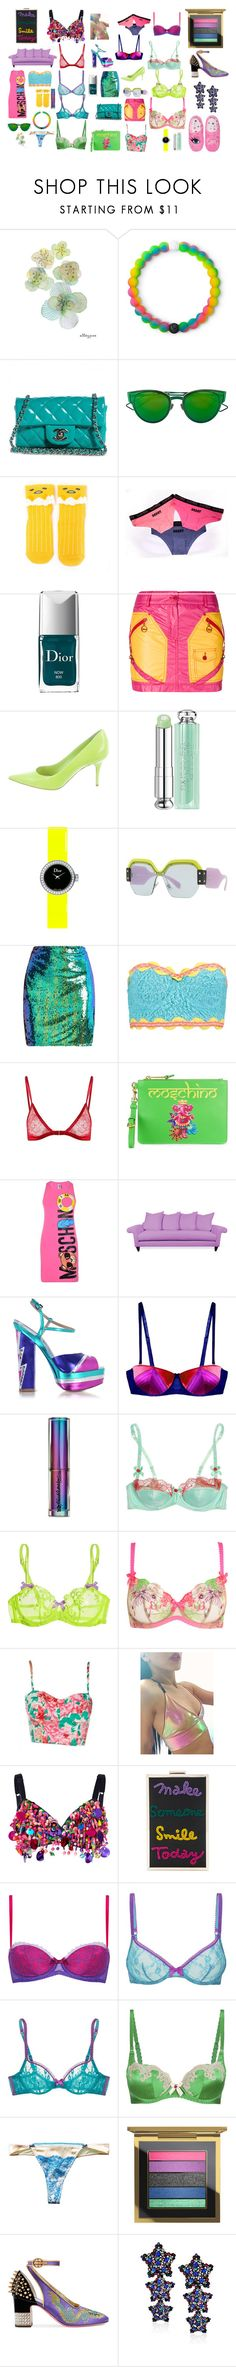 Designer Clothes, Shoes & Bags for Women Agent Provocateur, Heidi Klum, Moschino, Christian Dior, Gucci, Dolce Gabbana, Dsquared2, Polyvore, Shoe Bag